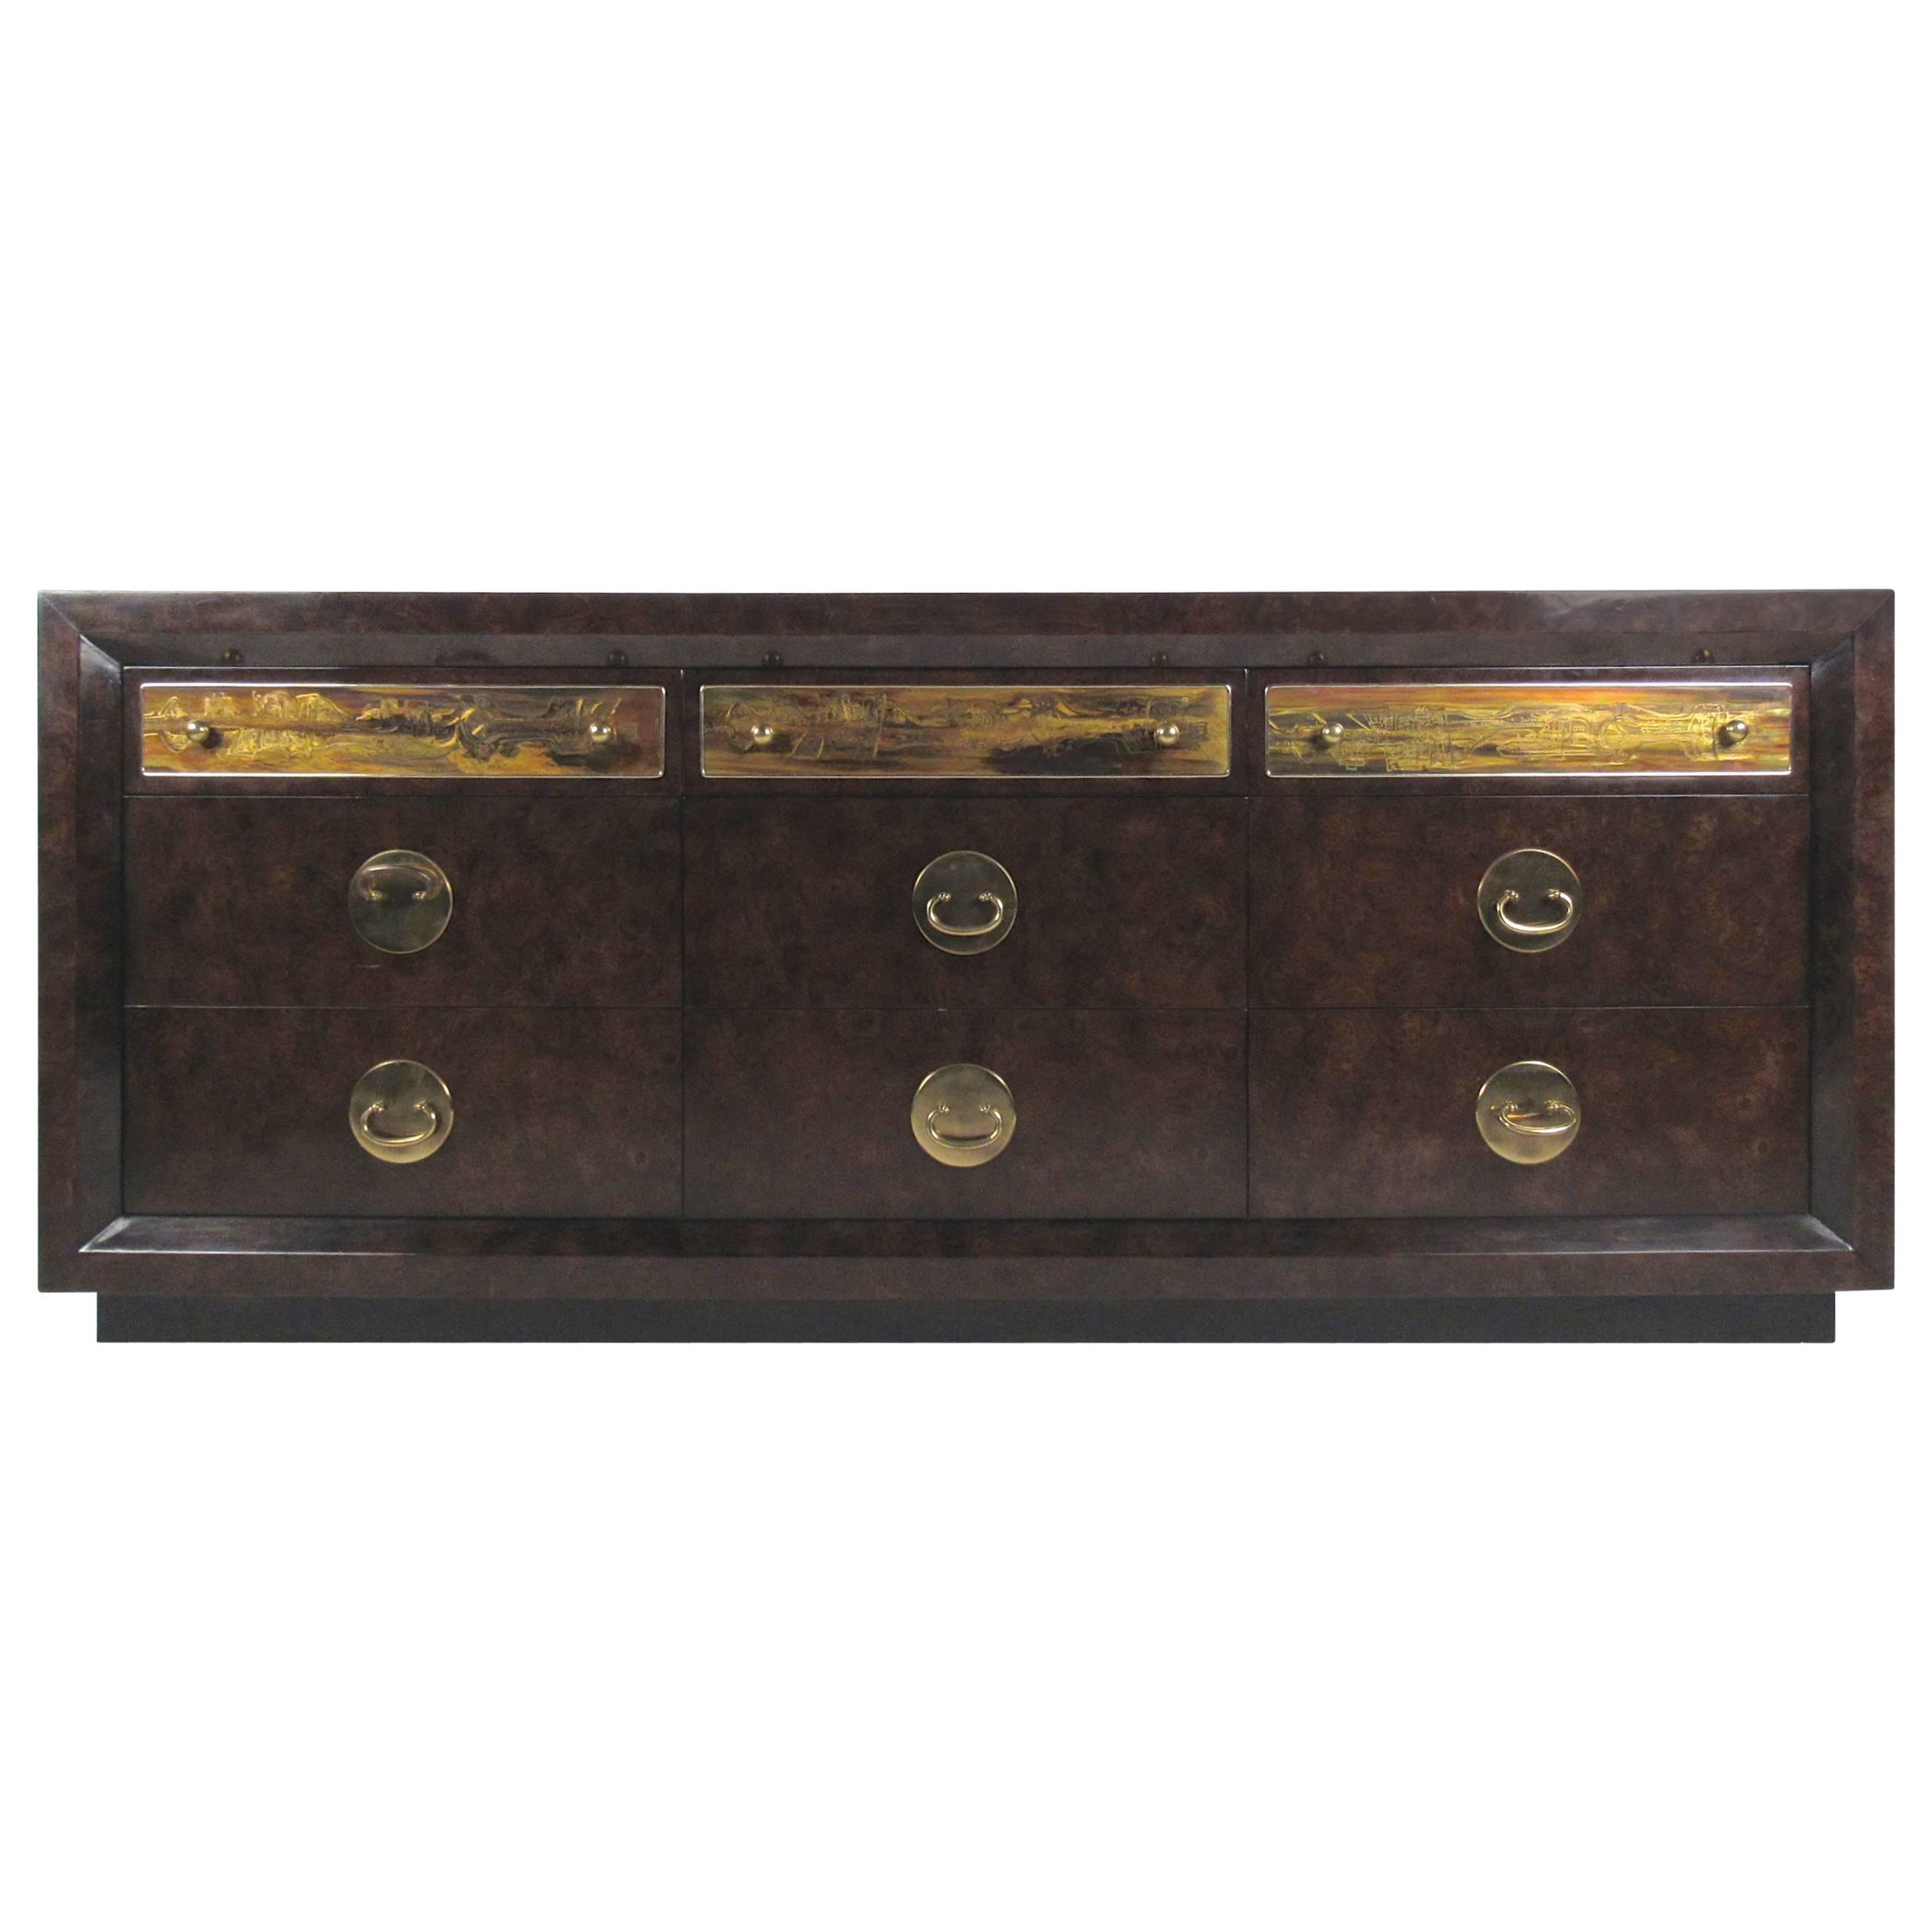 Brass and Burl Wood Dresser for Mastercraft by Bernhard Rohne